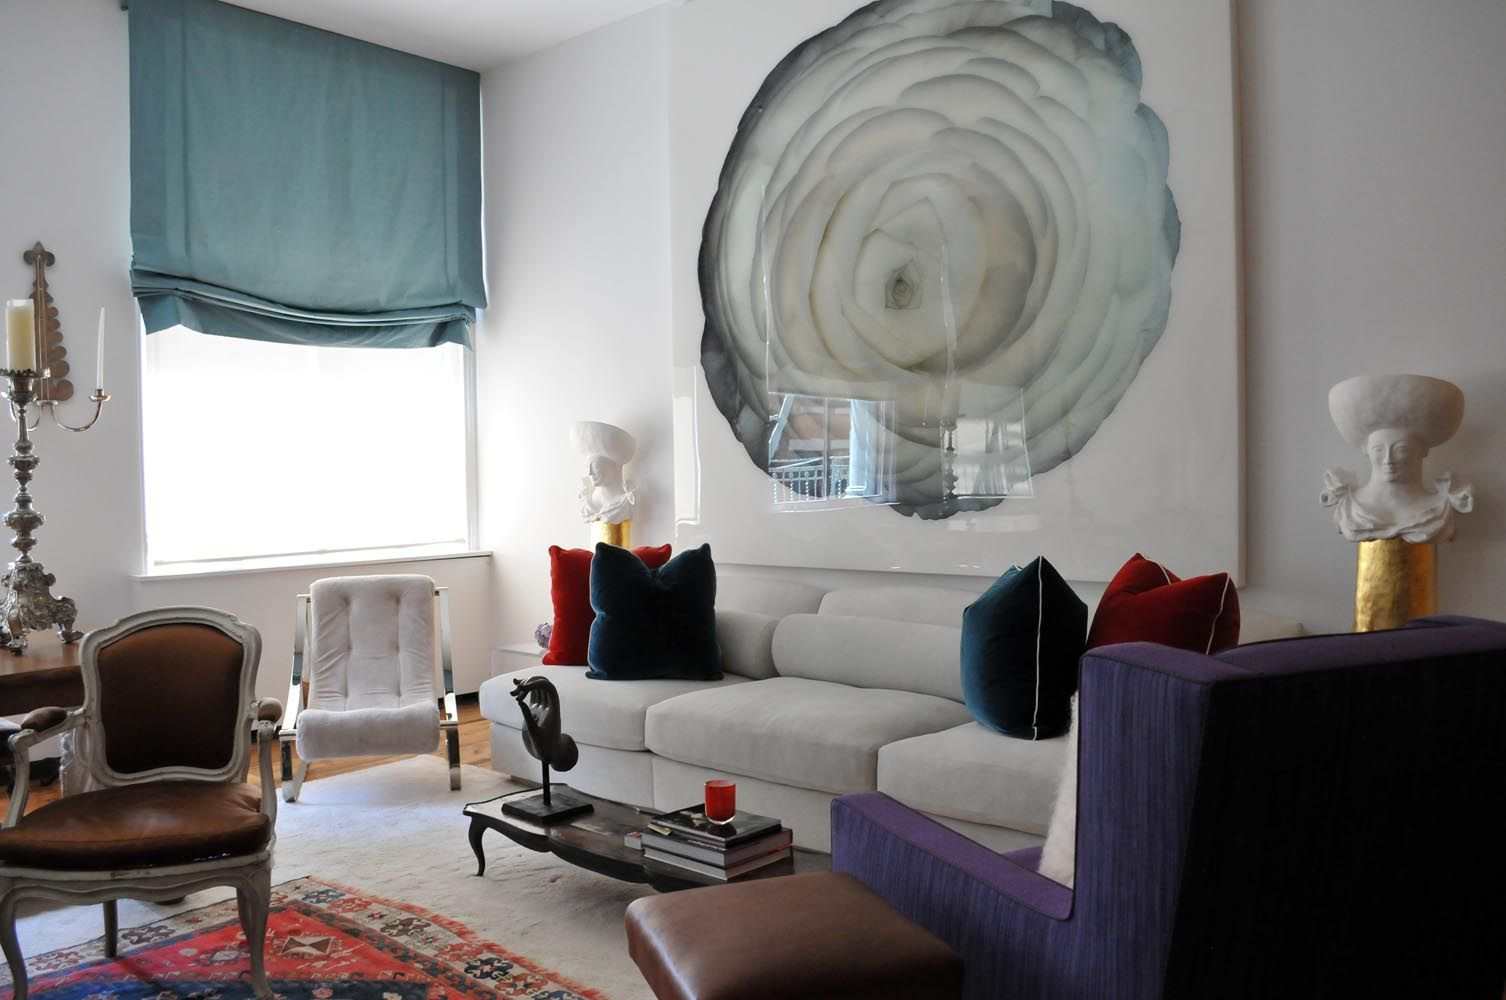 Robert couturier d cor architecture design my style - Robert couturier interior design ...